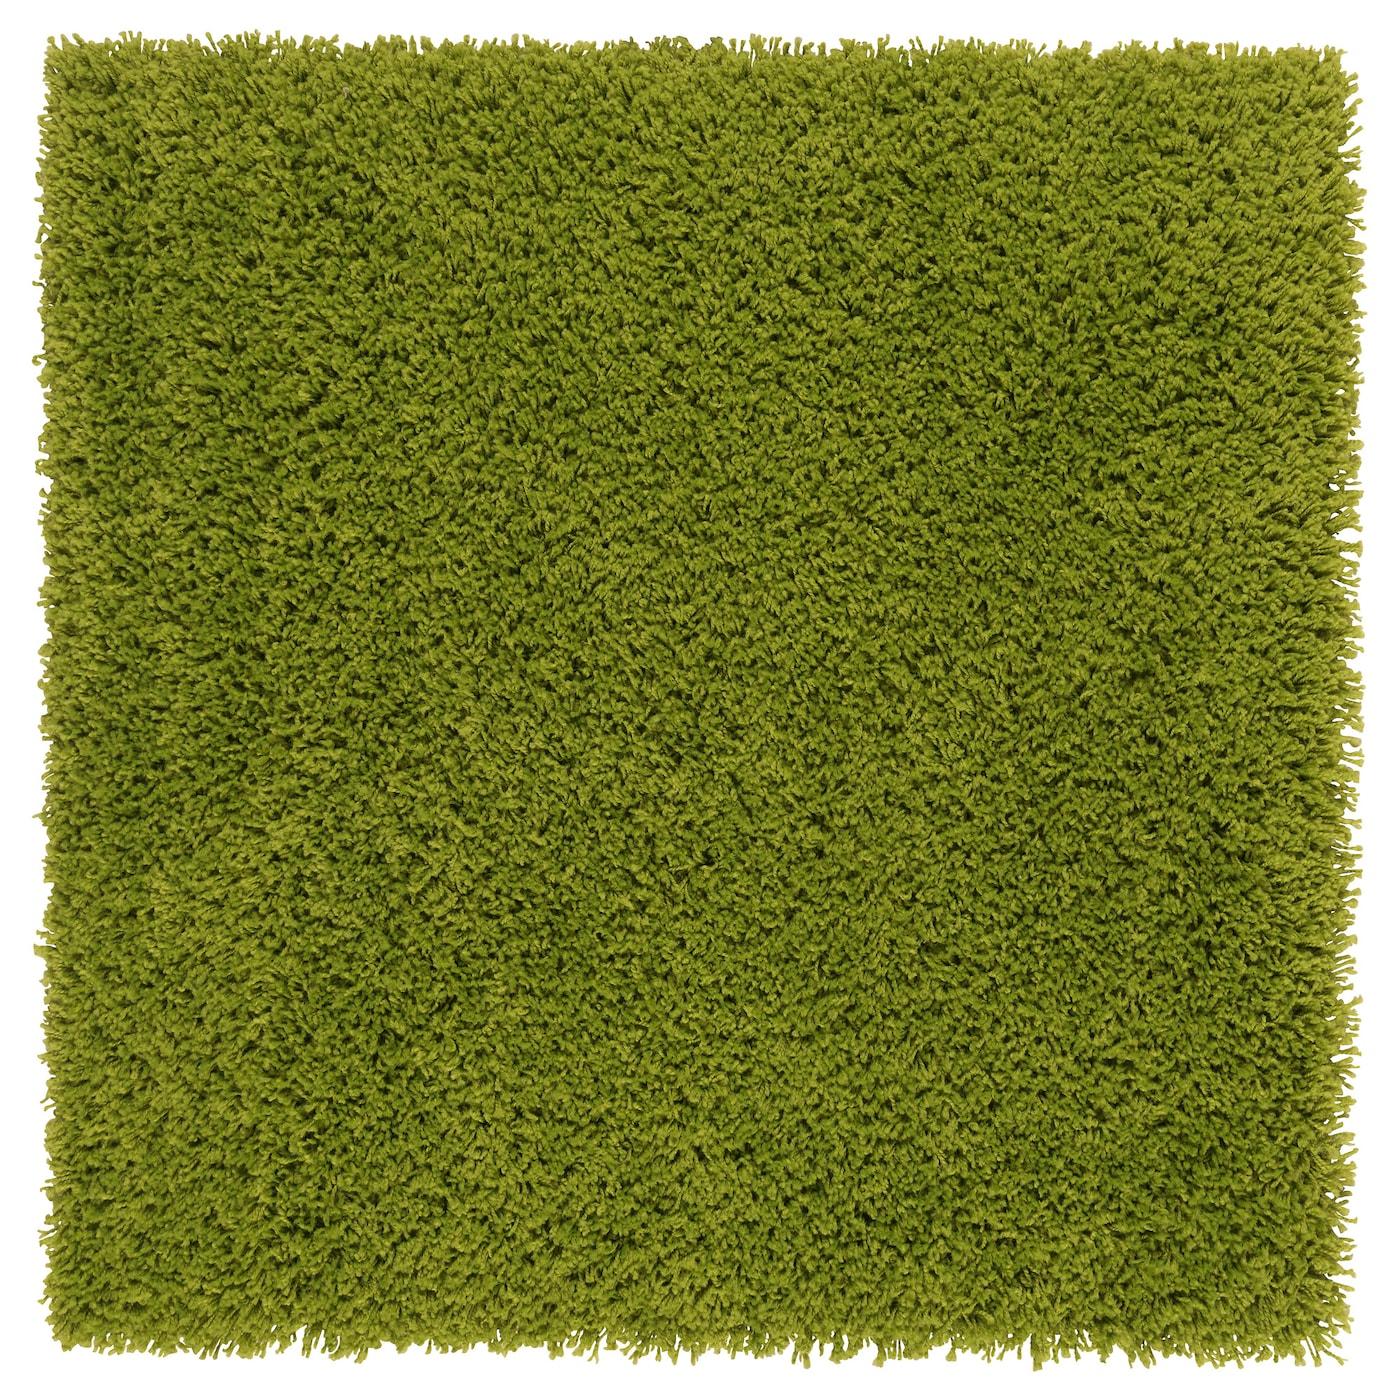 hampen tapis poils hauts vert vif 80 x 80 cm ikea. Black Bedroom Furniture Sets. Home Design Ideas